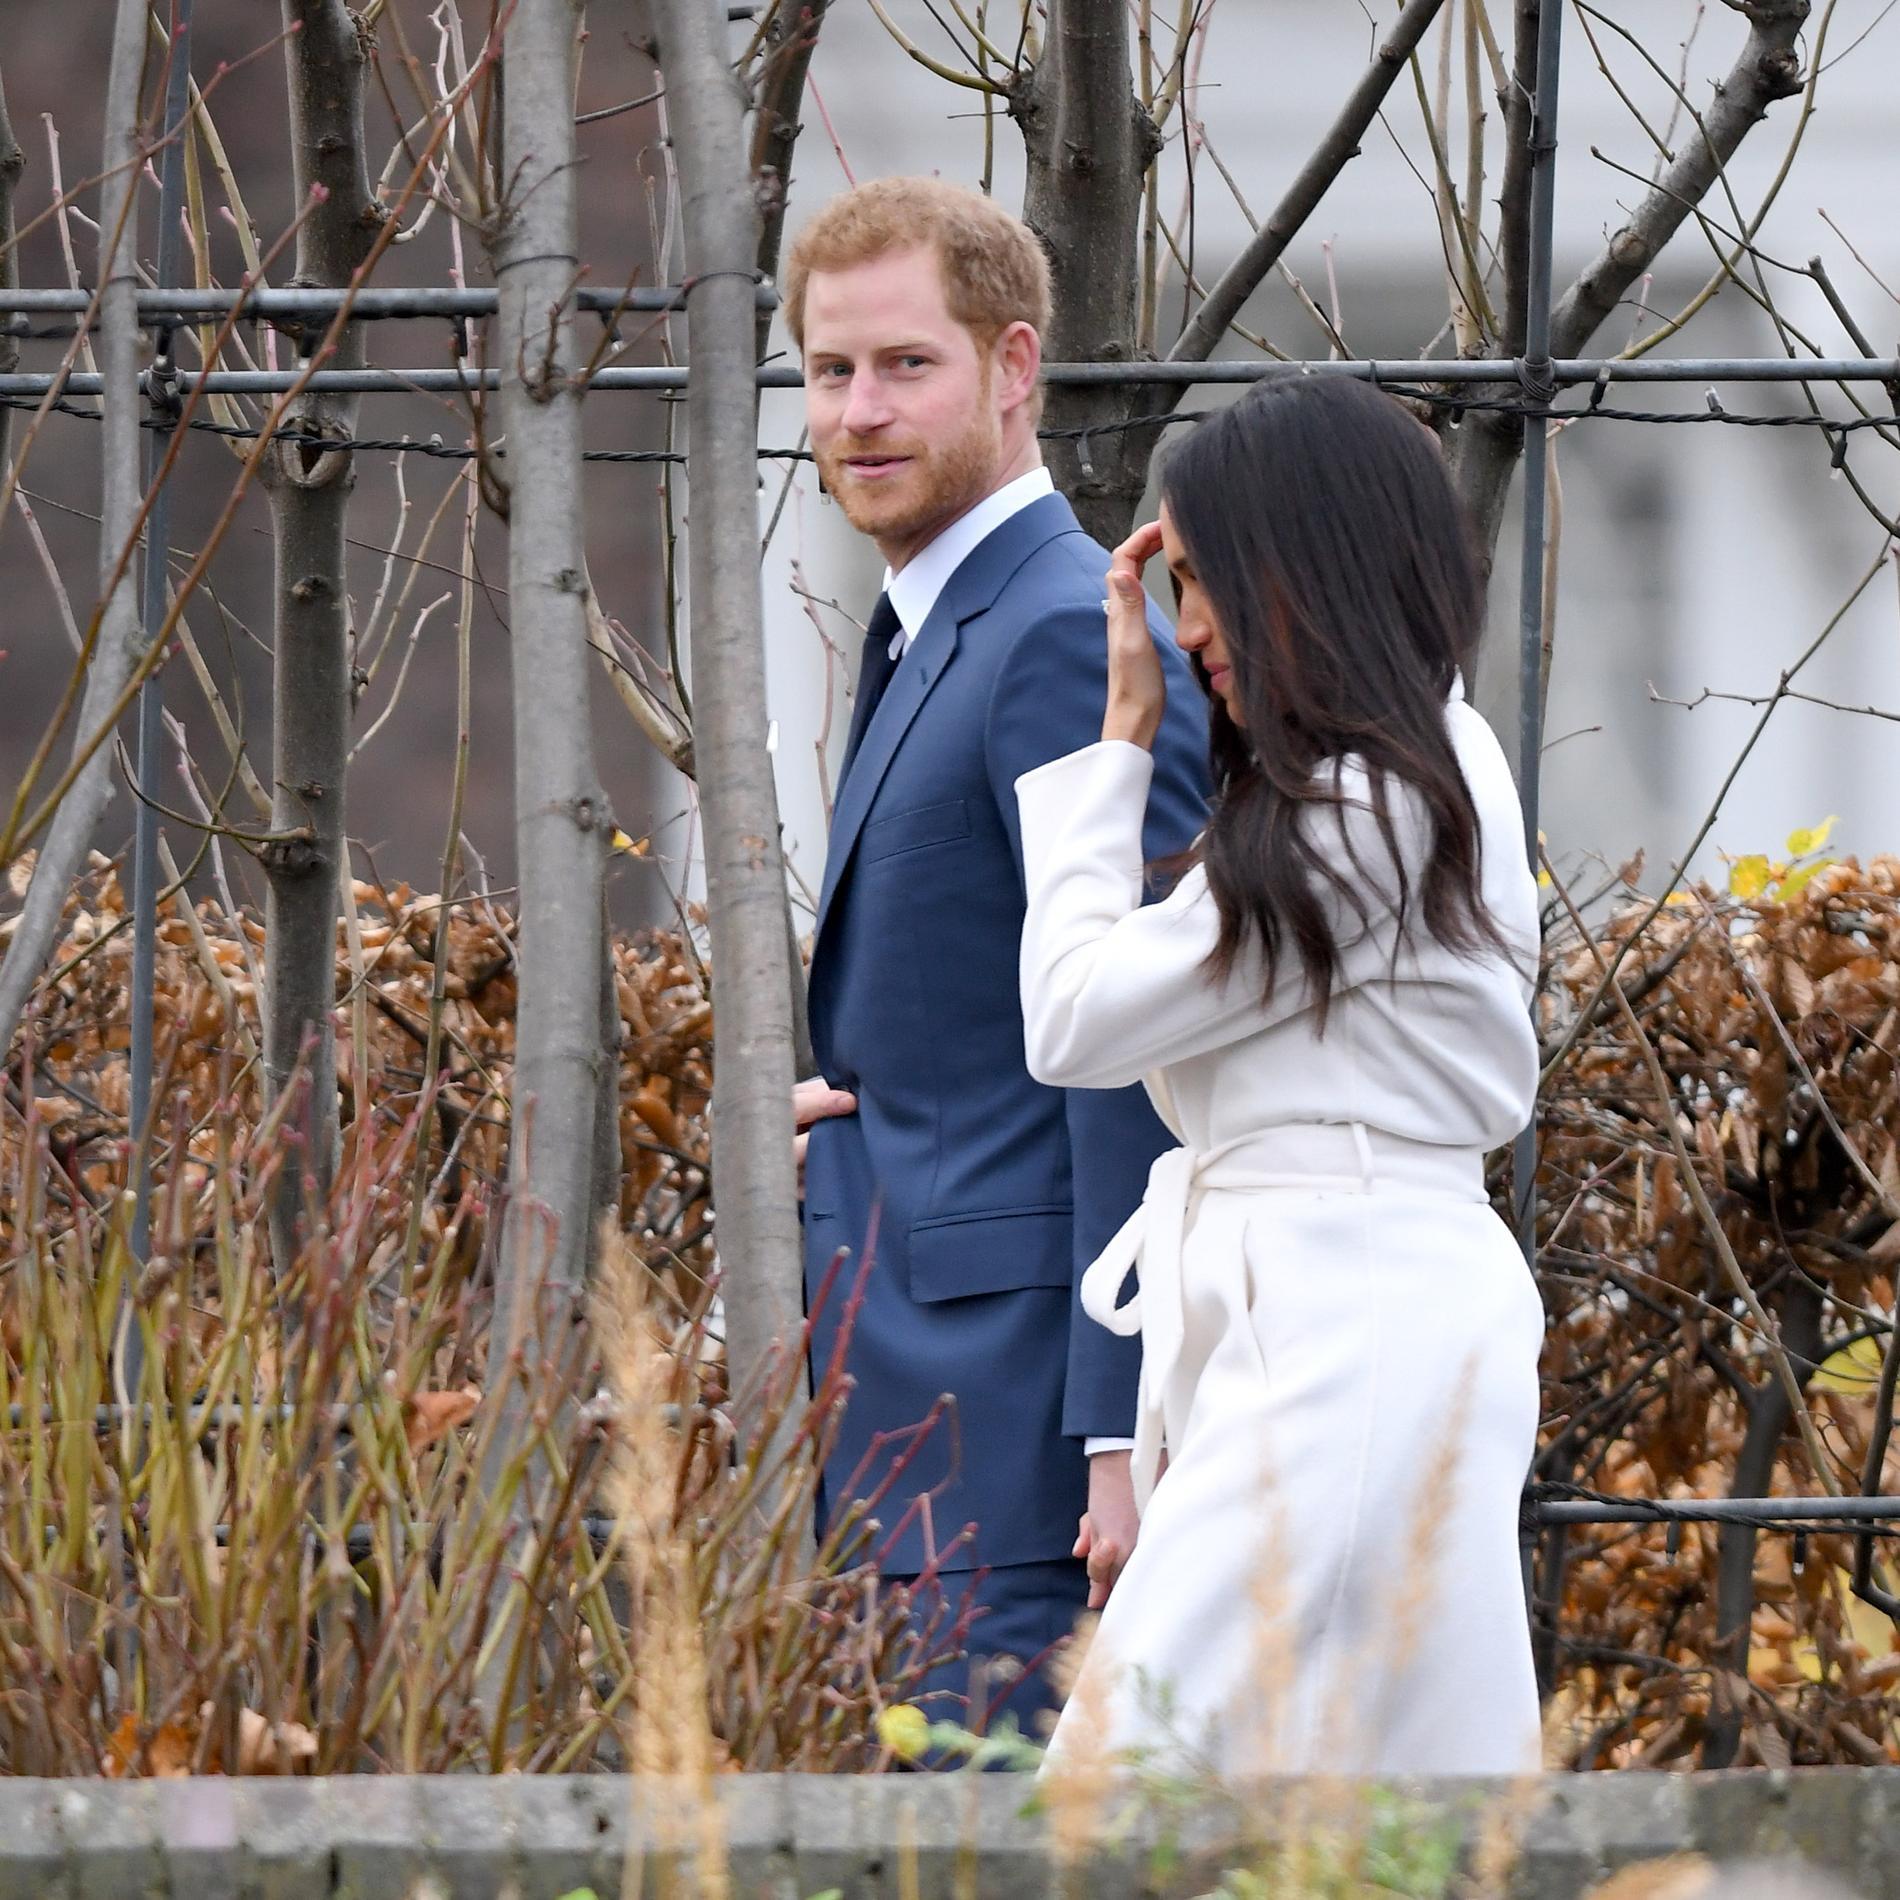 Mariage du prince Harry : Meghan Markle sera duchesse de Sussex